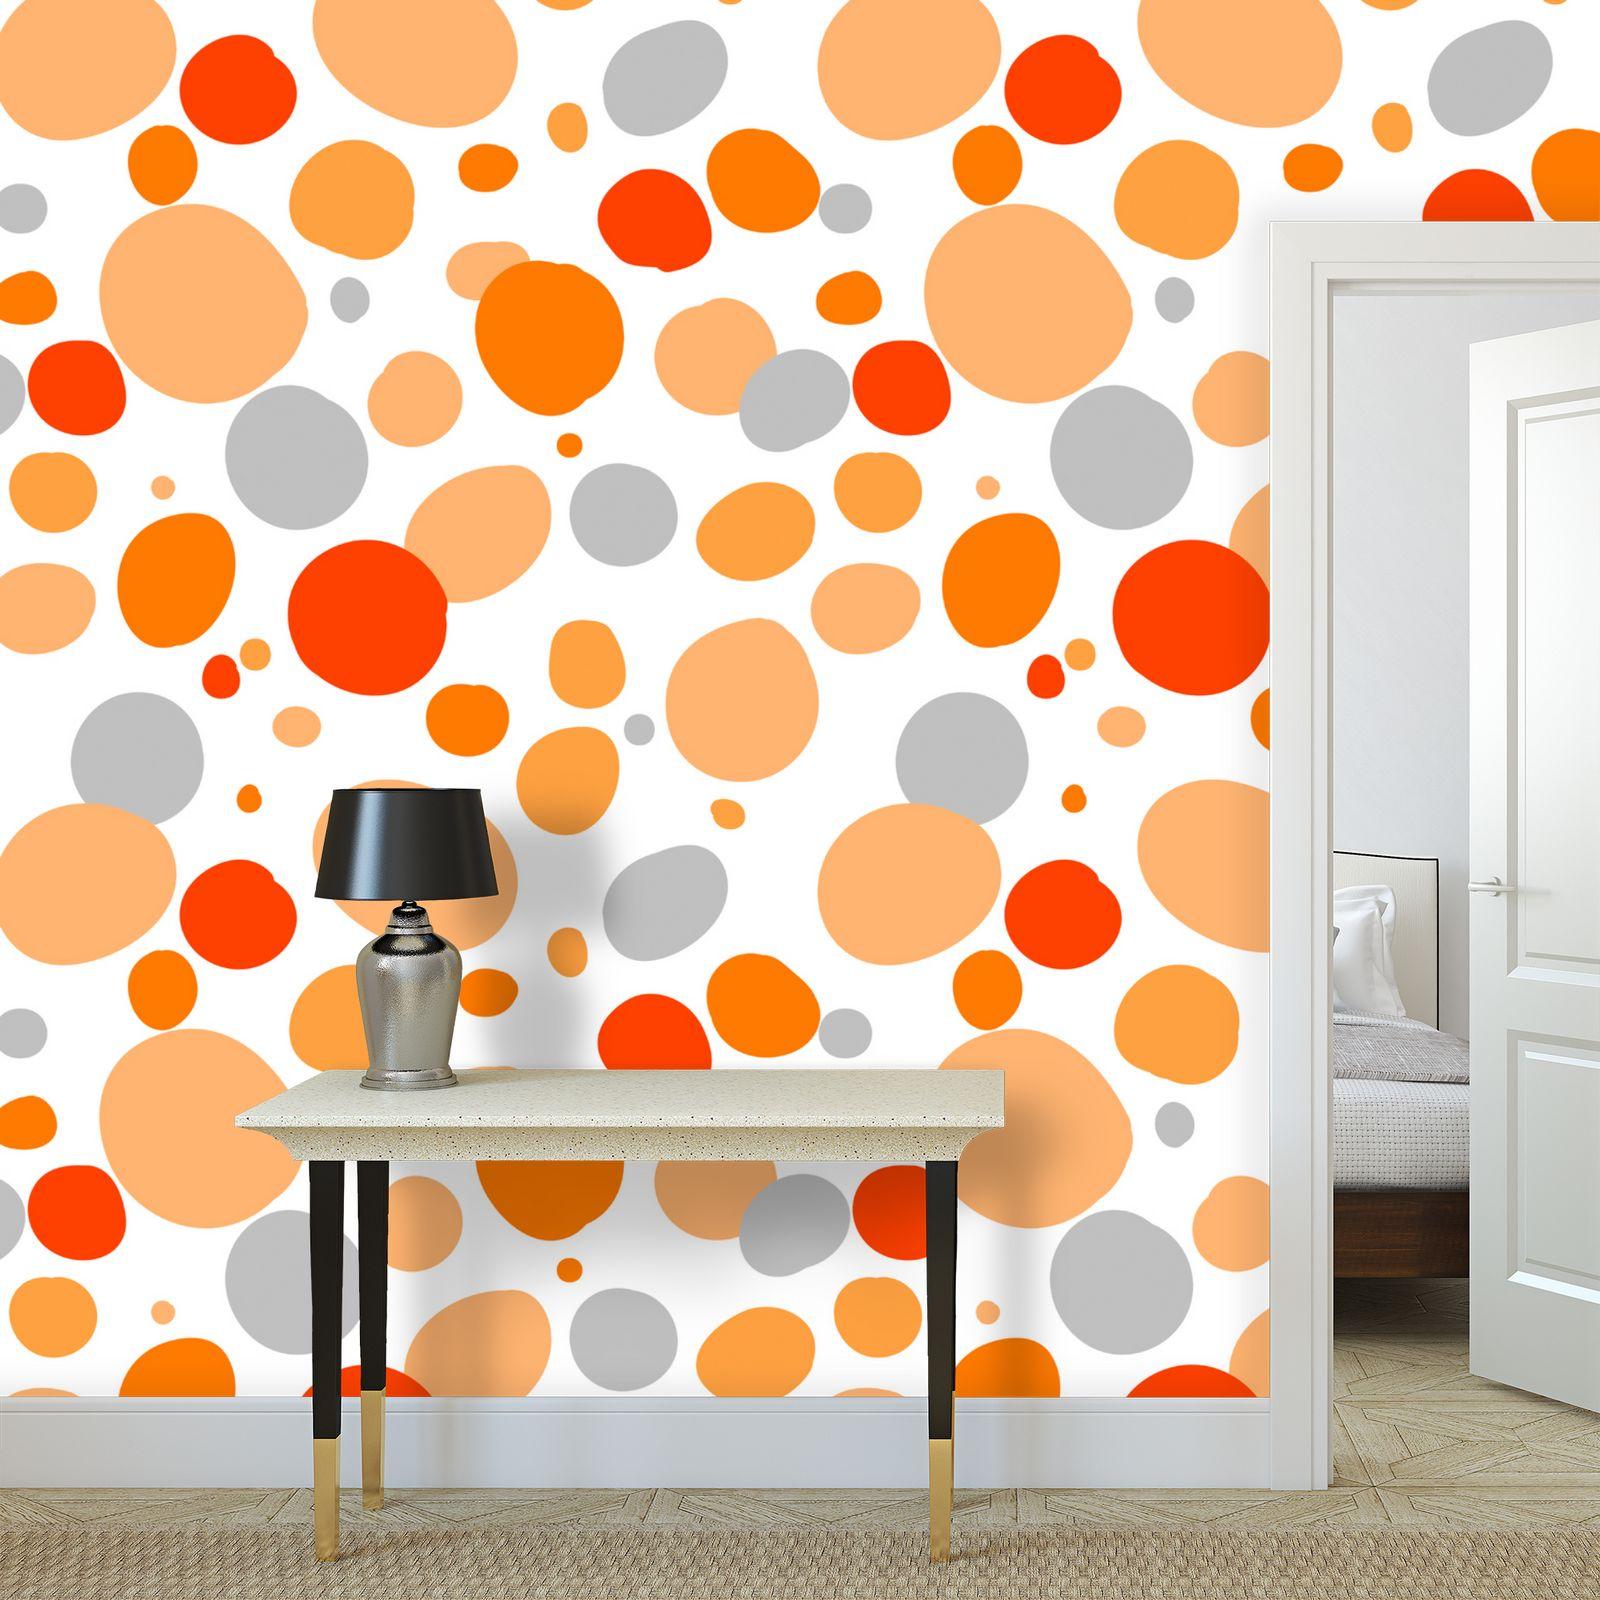 Orange Joy - Wallpaper Rolls - abstract bright spots, cheerful gift, sunny summer.